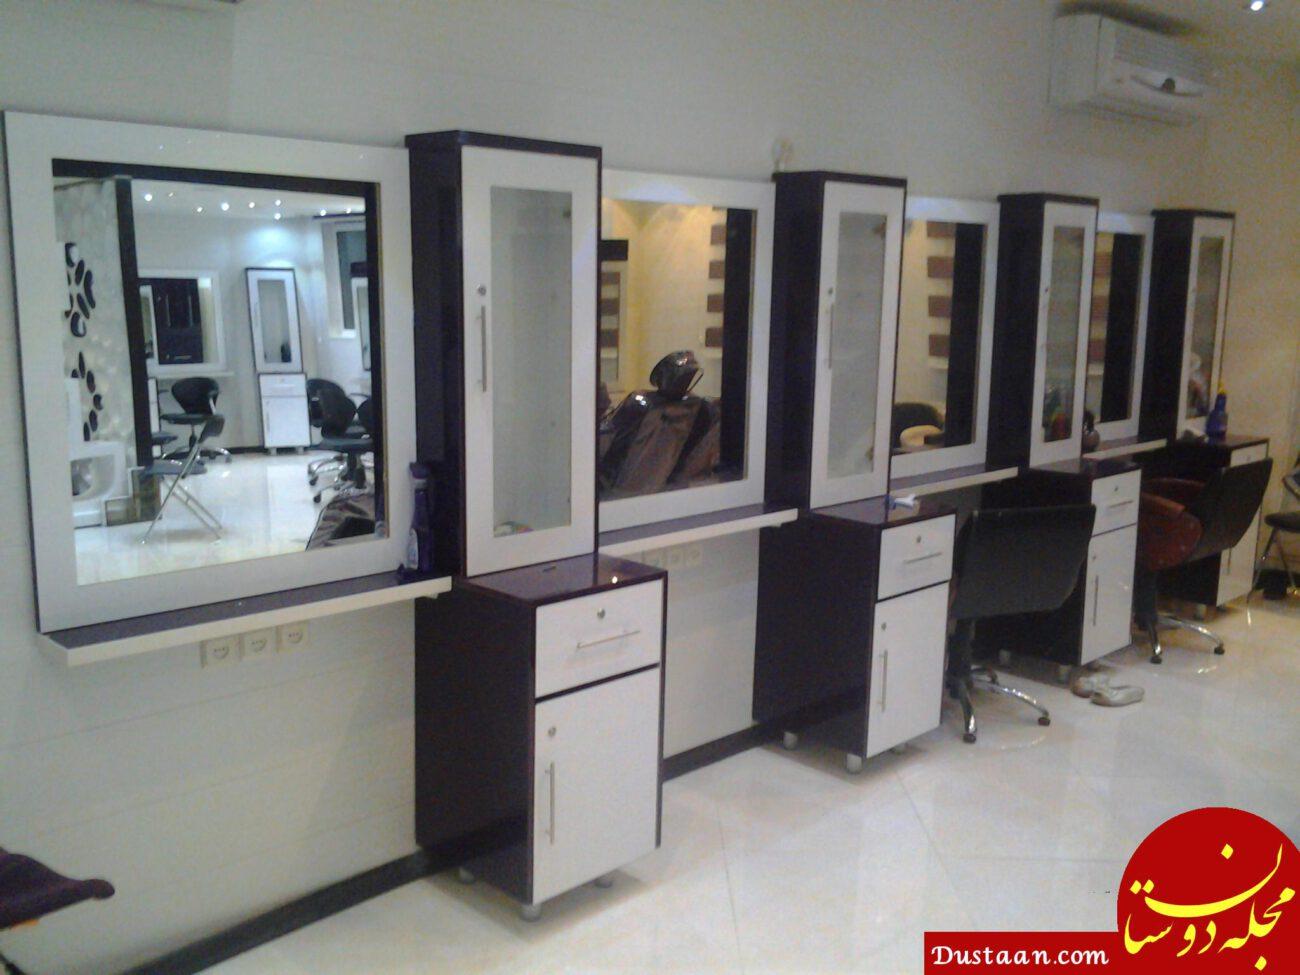 www.dustaan.com میمون وارد آرایشگاه زنانه شد/ هم او ترسید، هم زنها